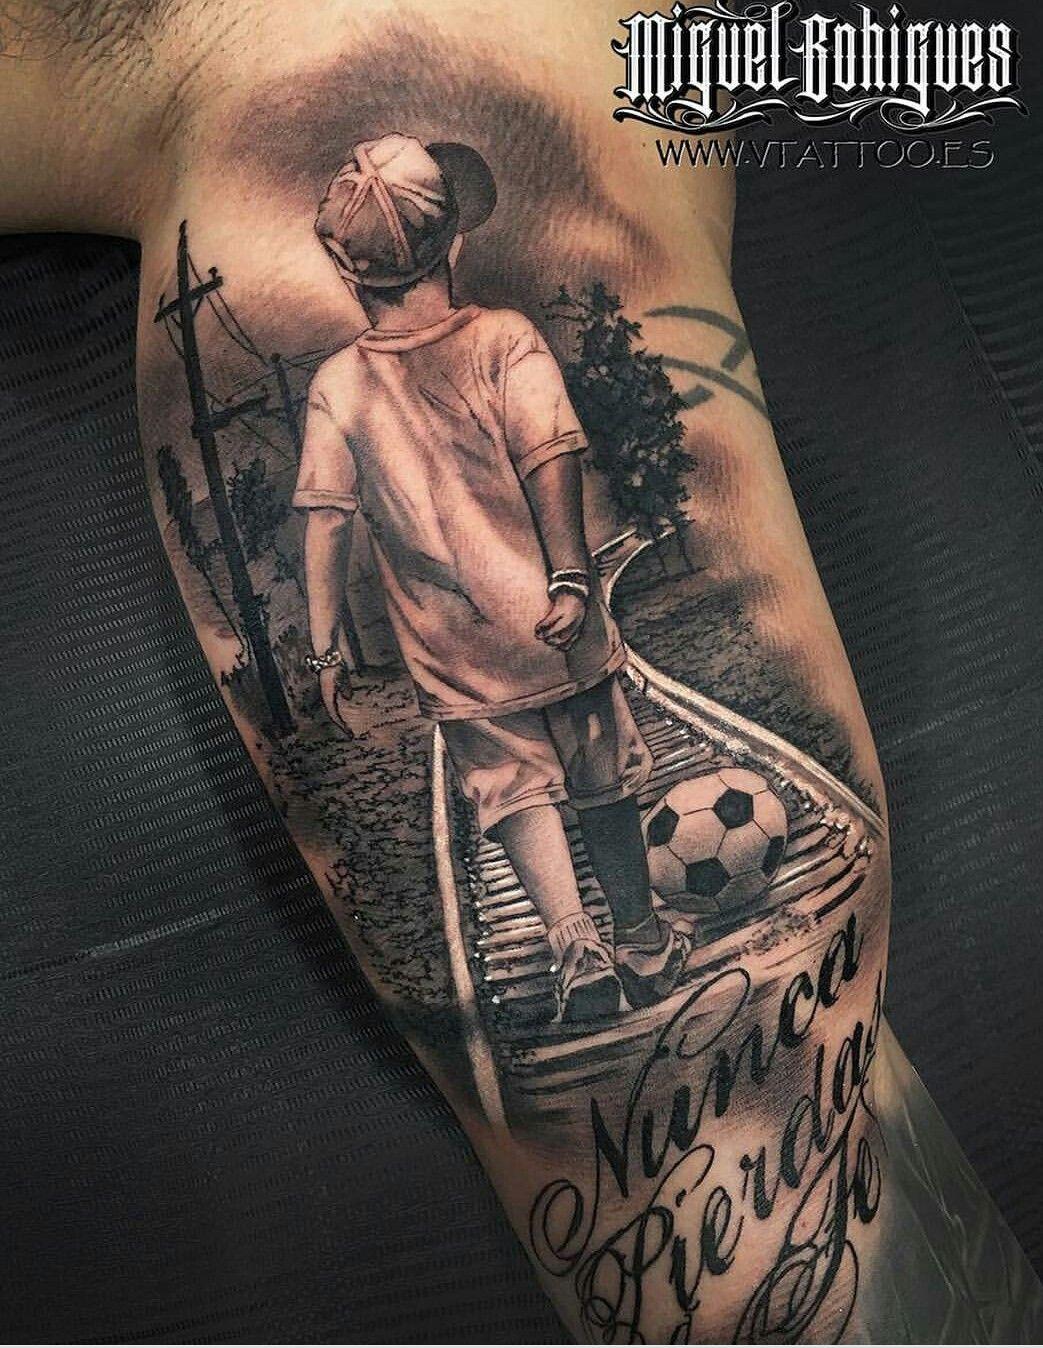 This Is Crazy Tattoos Tattoos Soccer Tattoos Tattoo Designs